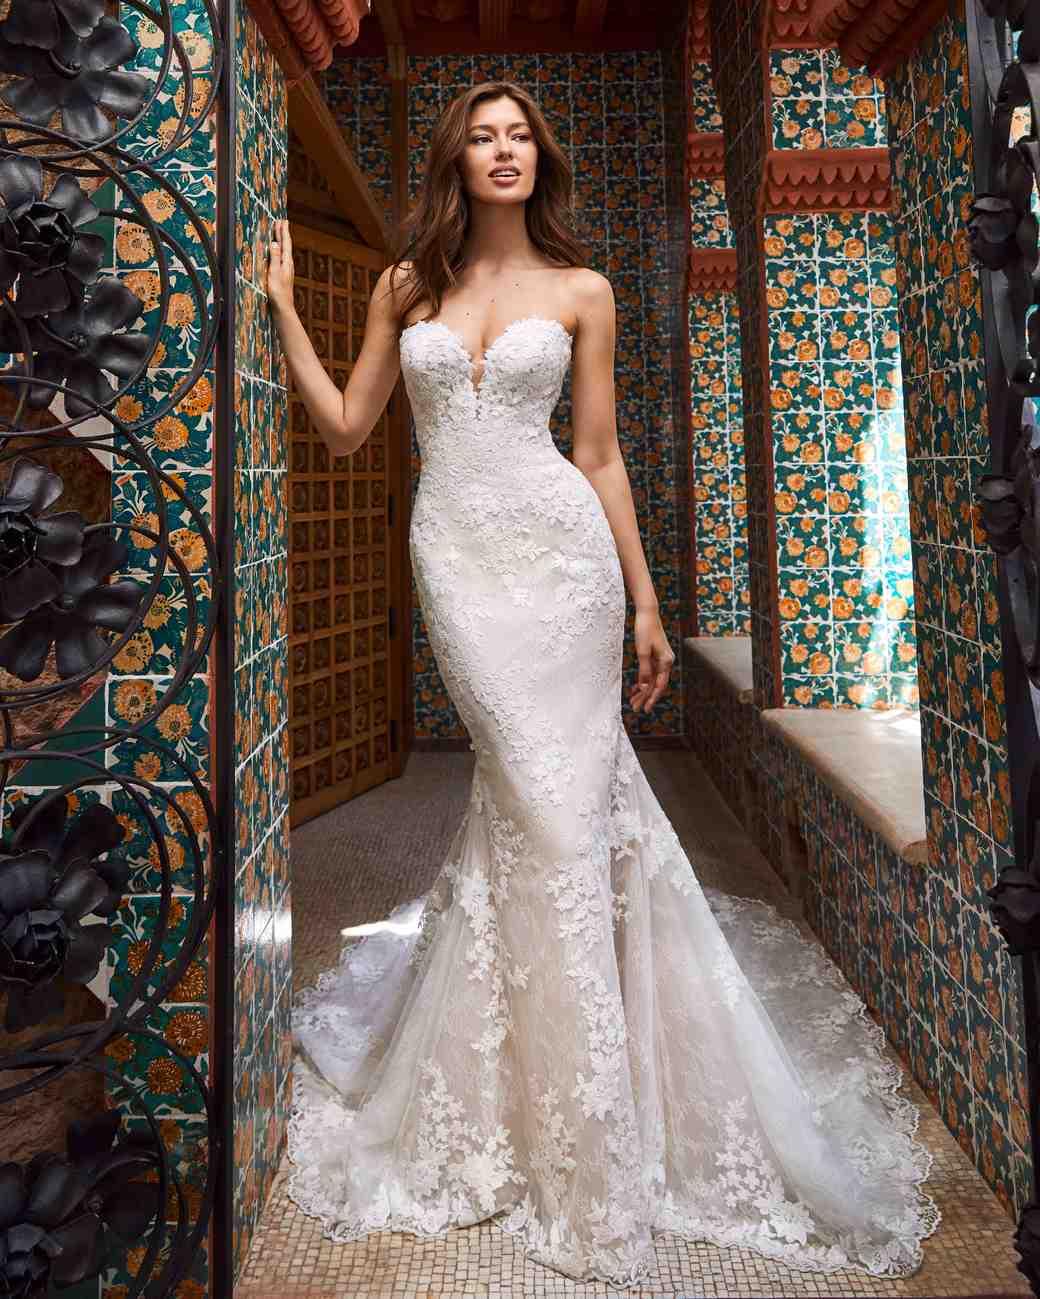 pronovias kleinfeld wedding dress fall 2019 04